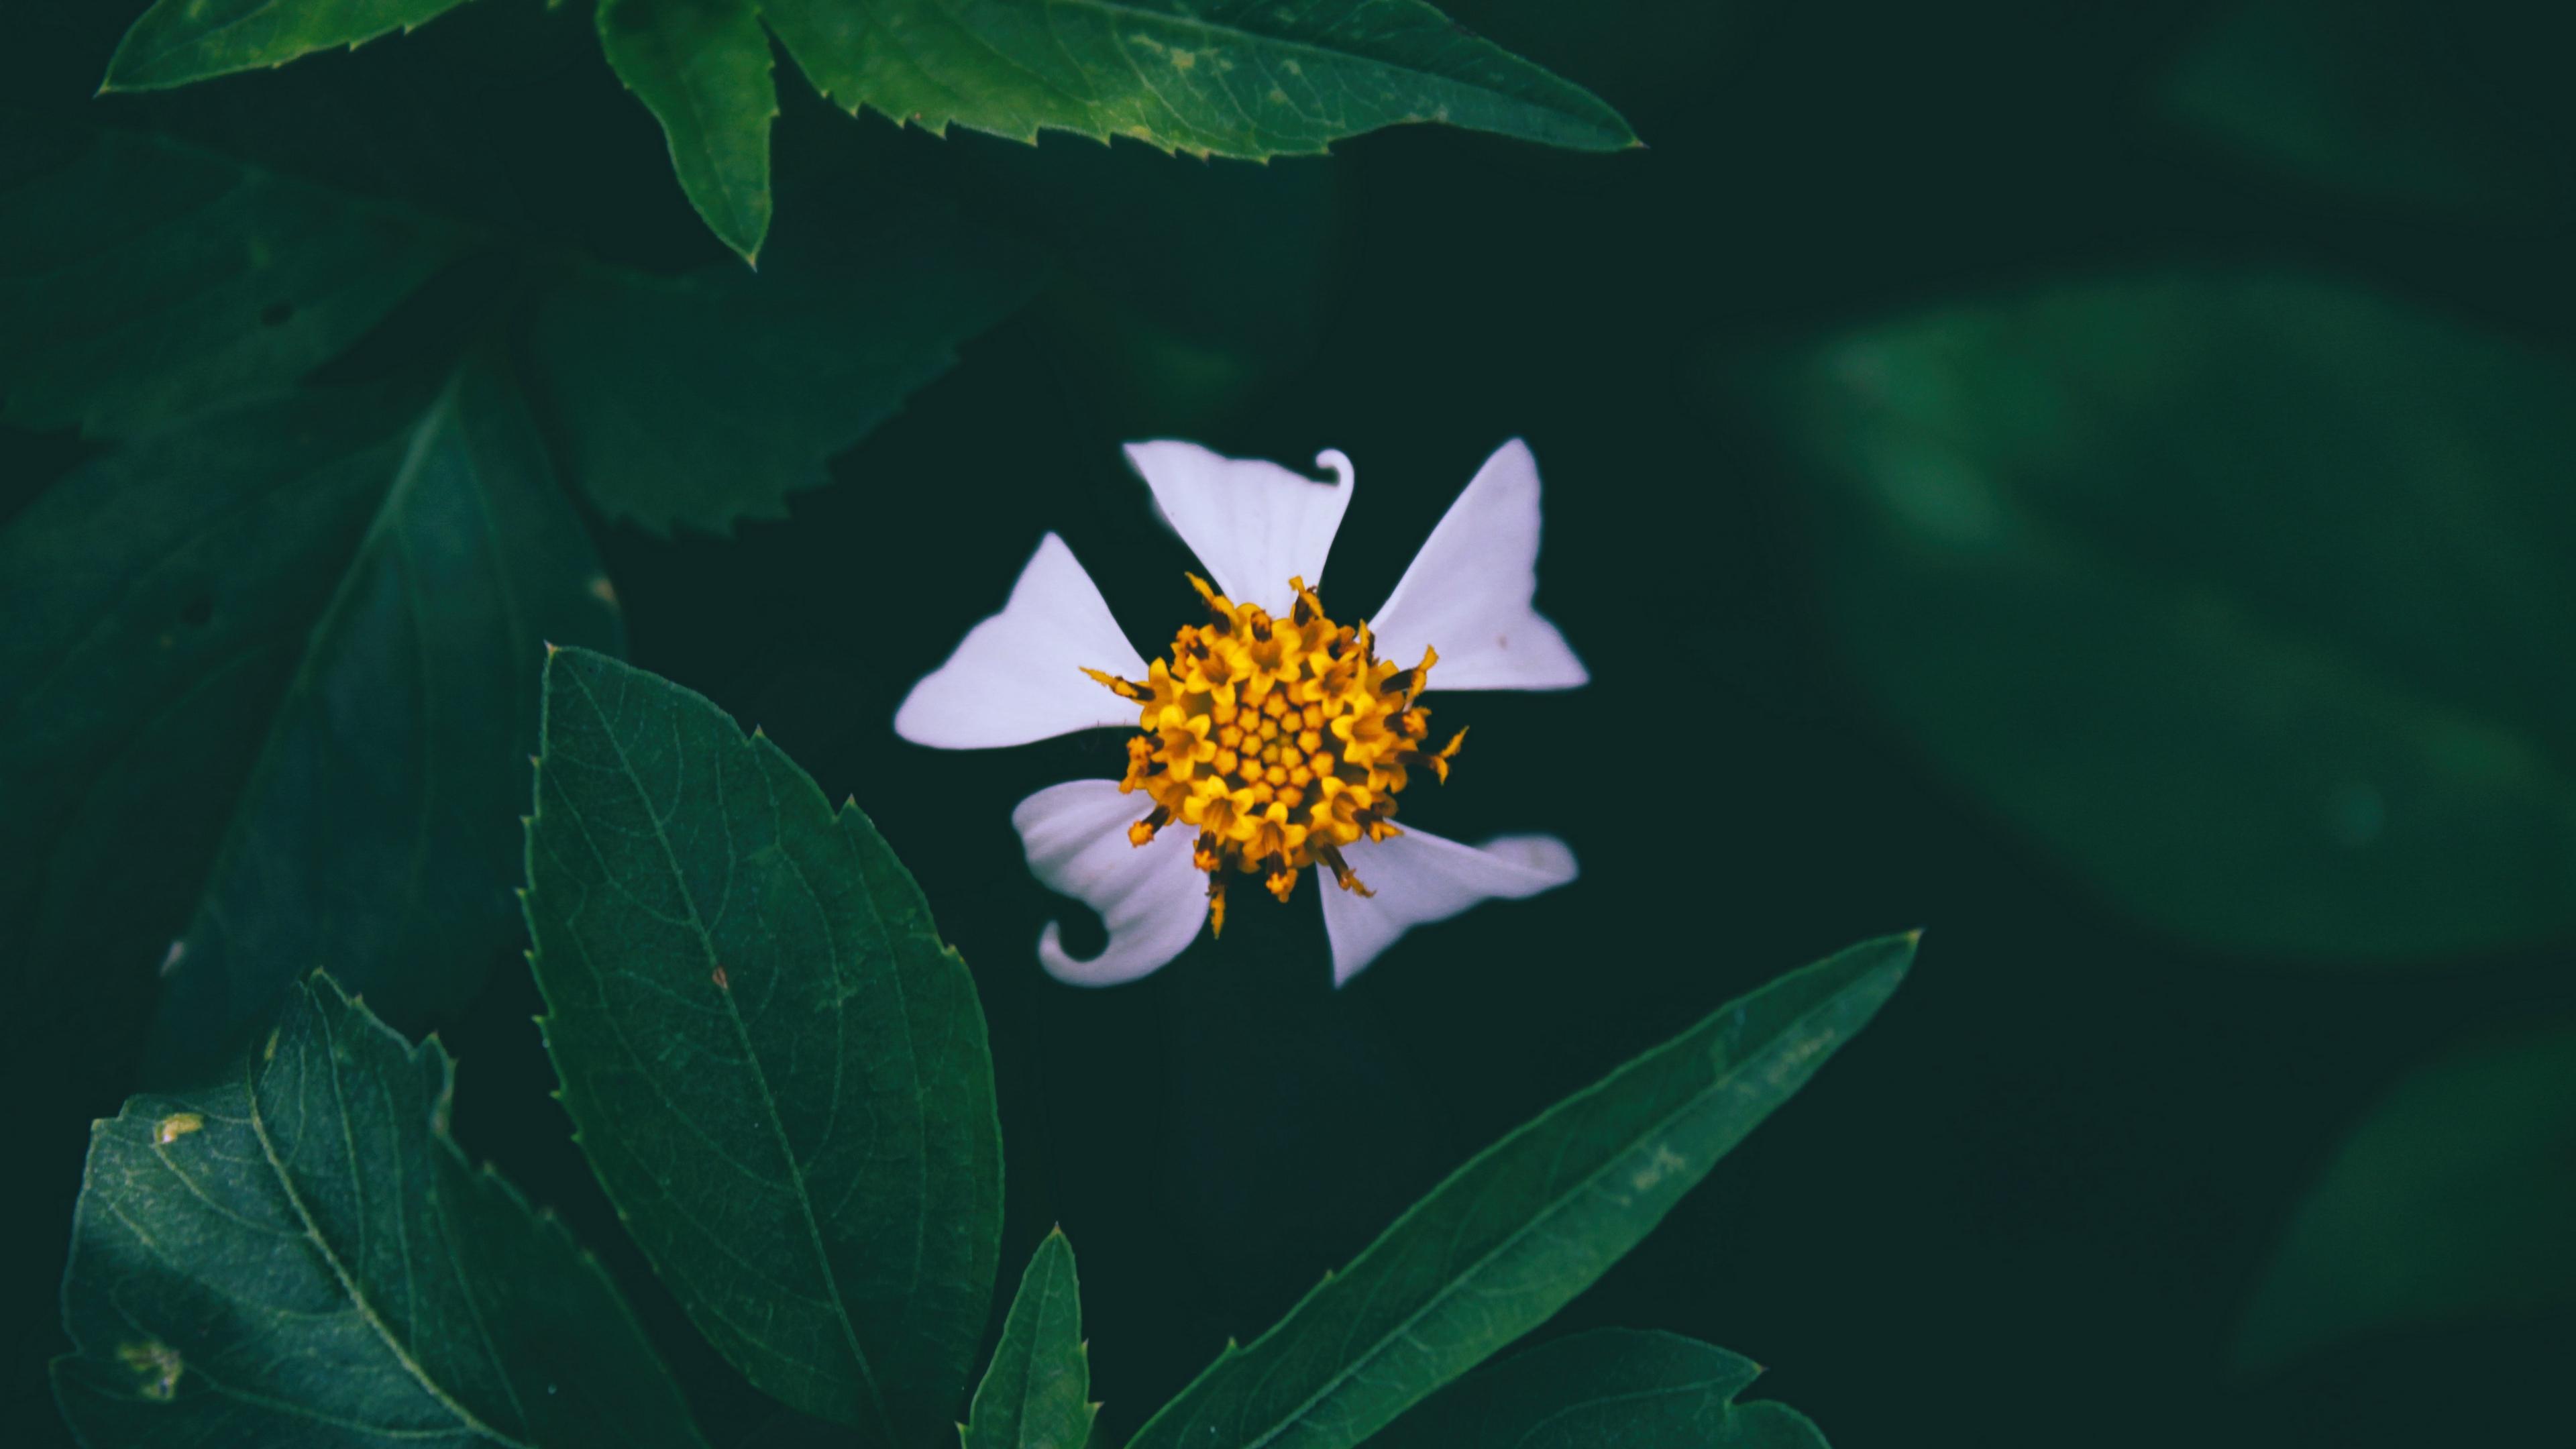 flower closeup bud petals 4k 1540064427 - flower, closeup, bud, petals 4k - flower, Closeup, bud